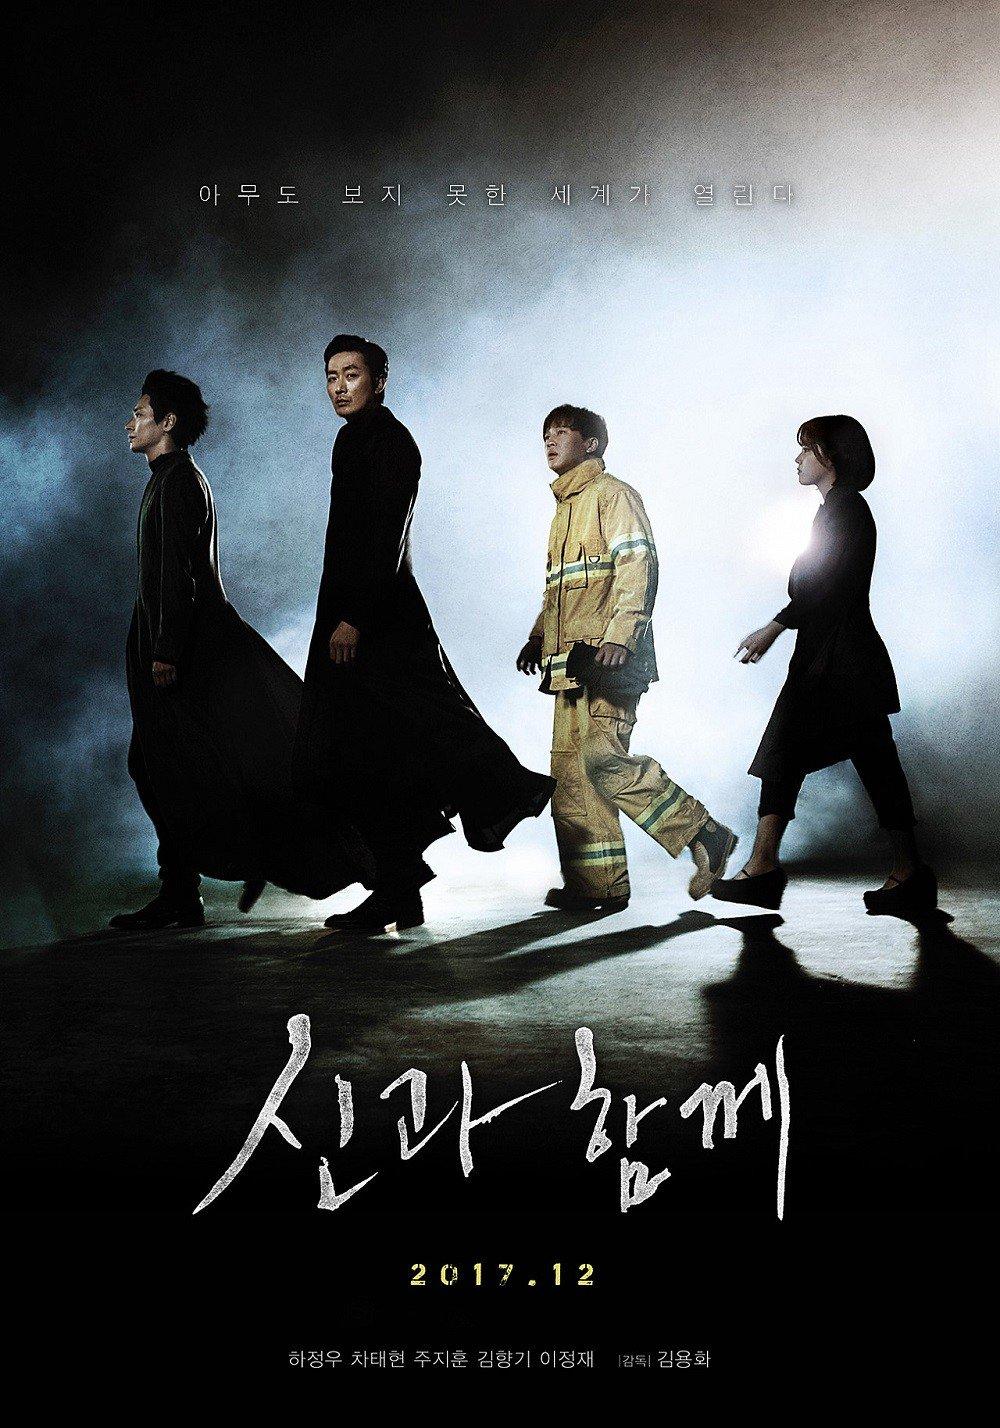 EXO-DO-cha-tae-hyun-joo-ji-hoon-ha-jung-woo.jpg